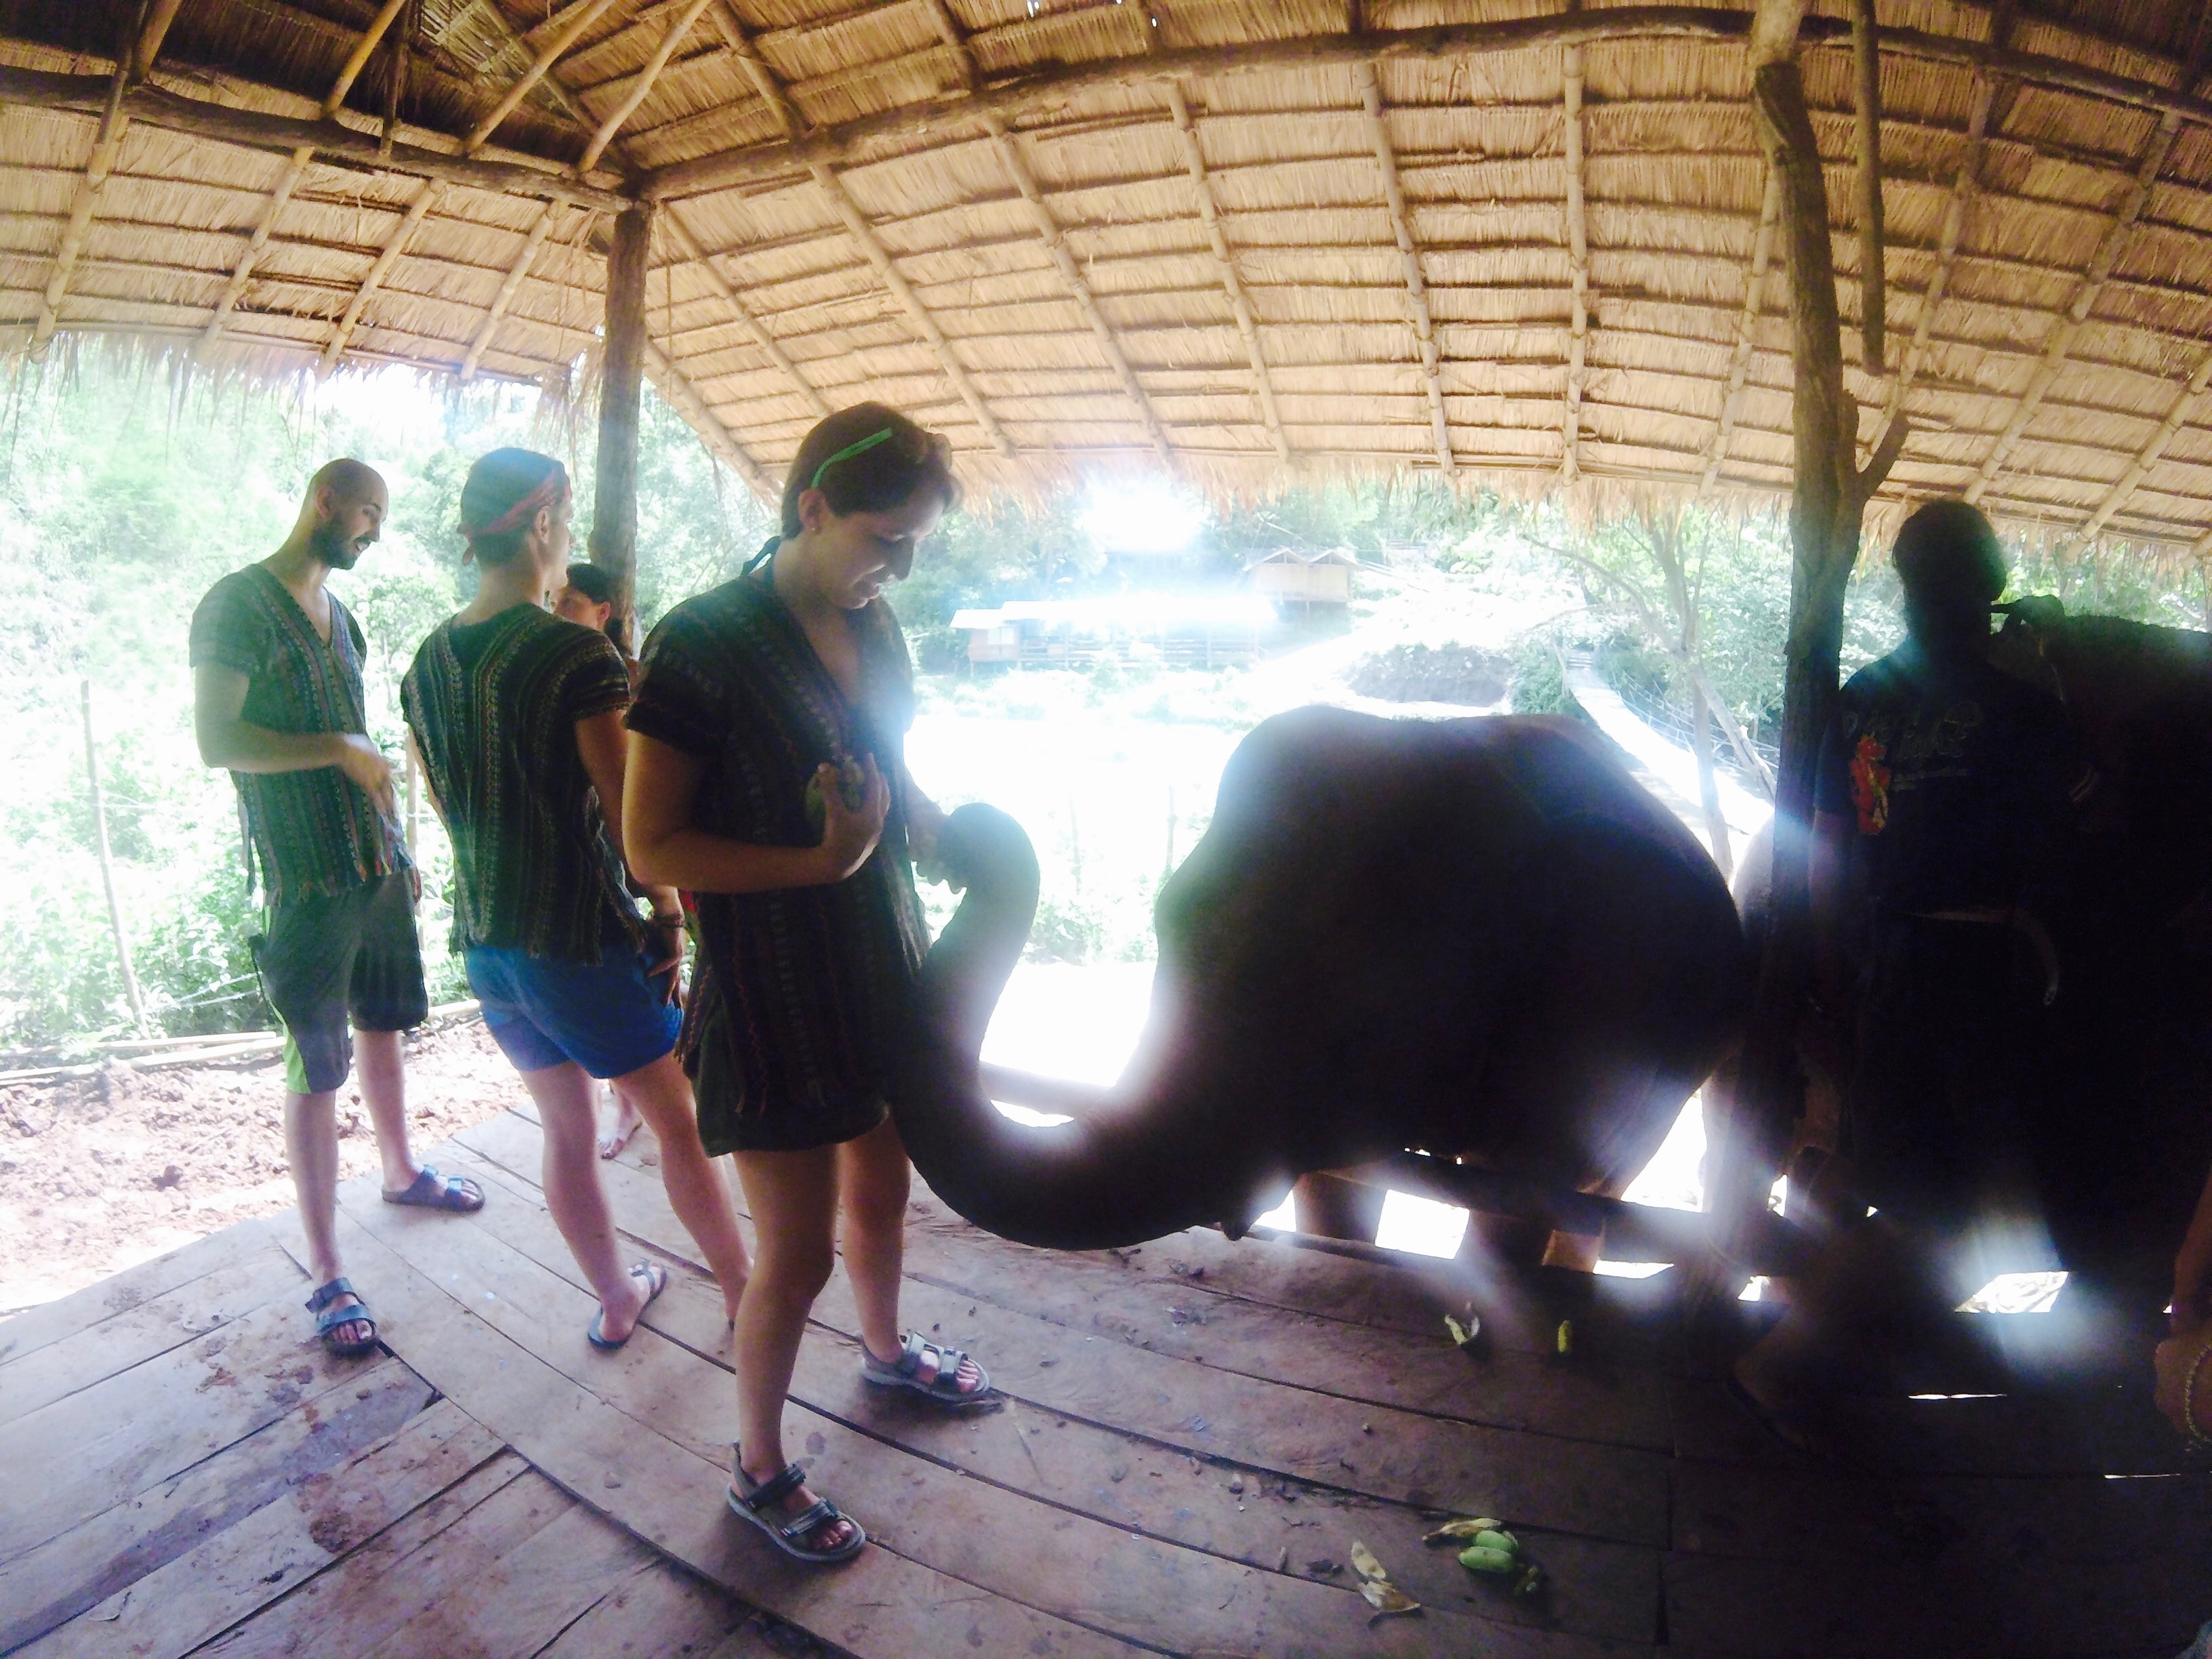 elephant jungle sanctuary cristina nogueras beaches & brie thailand